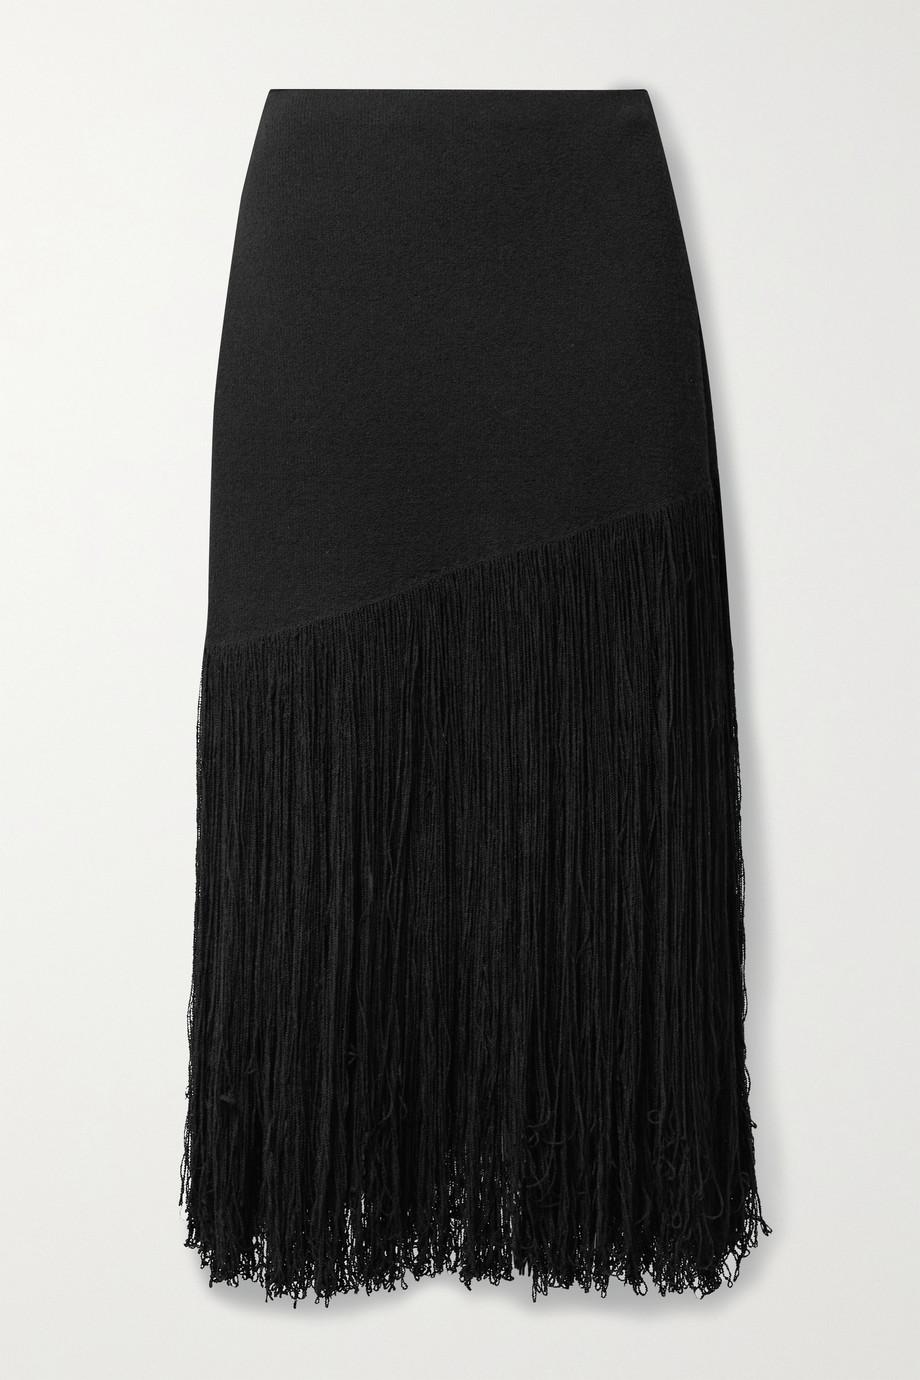 Proenza Schouler Fringed cotton-blend midi skirt